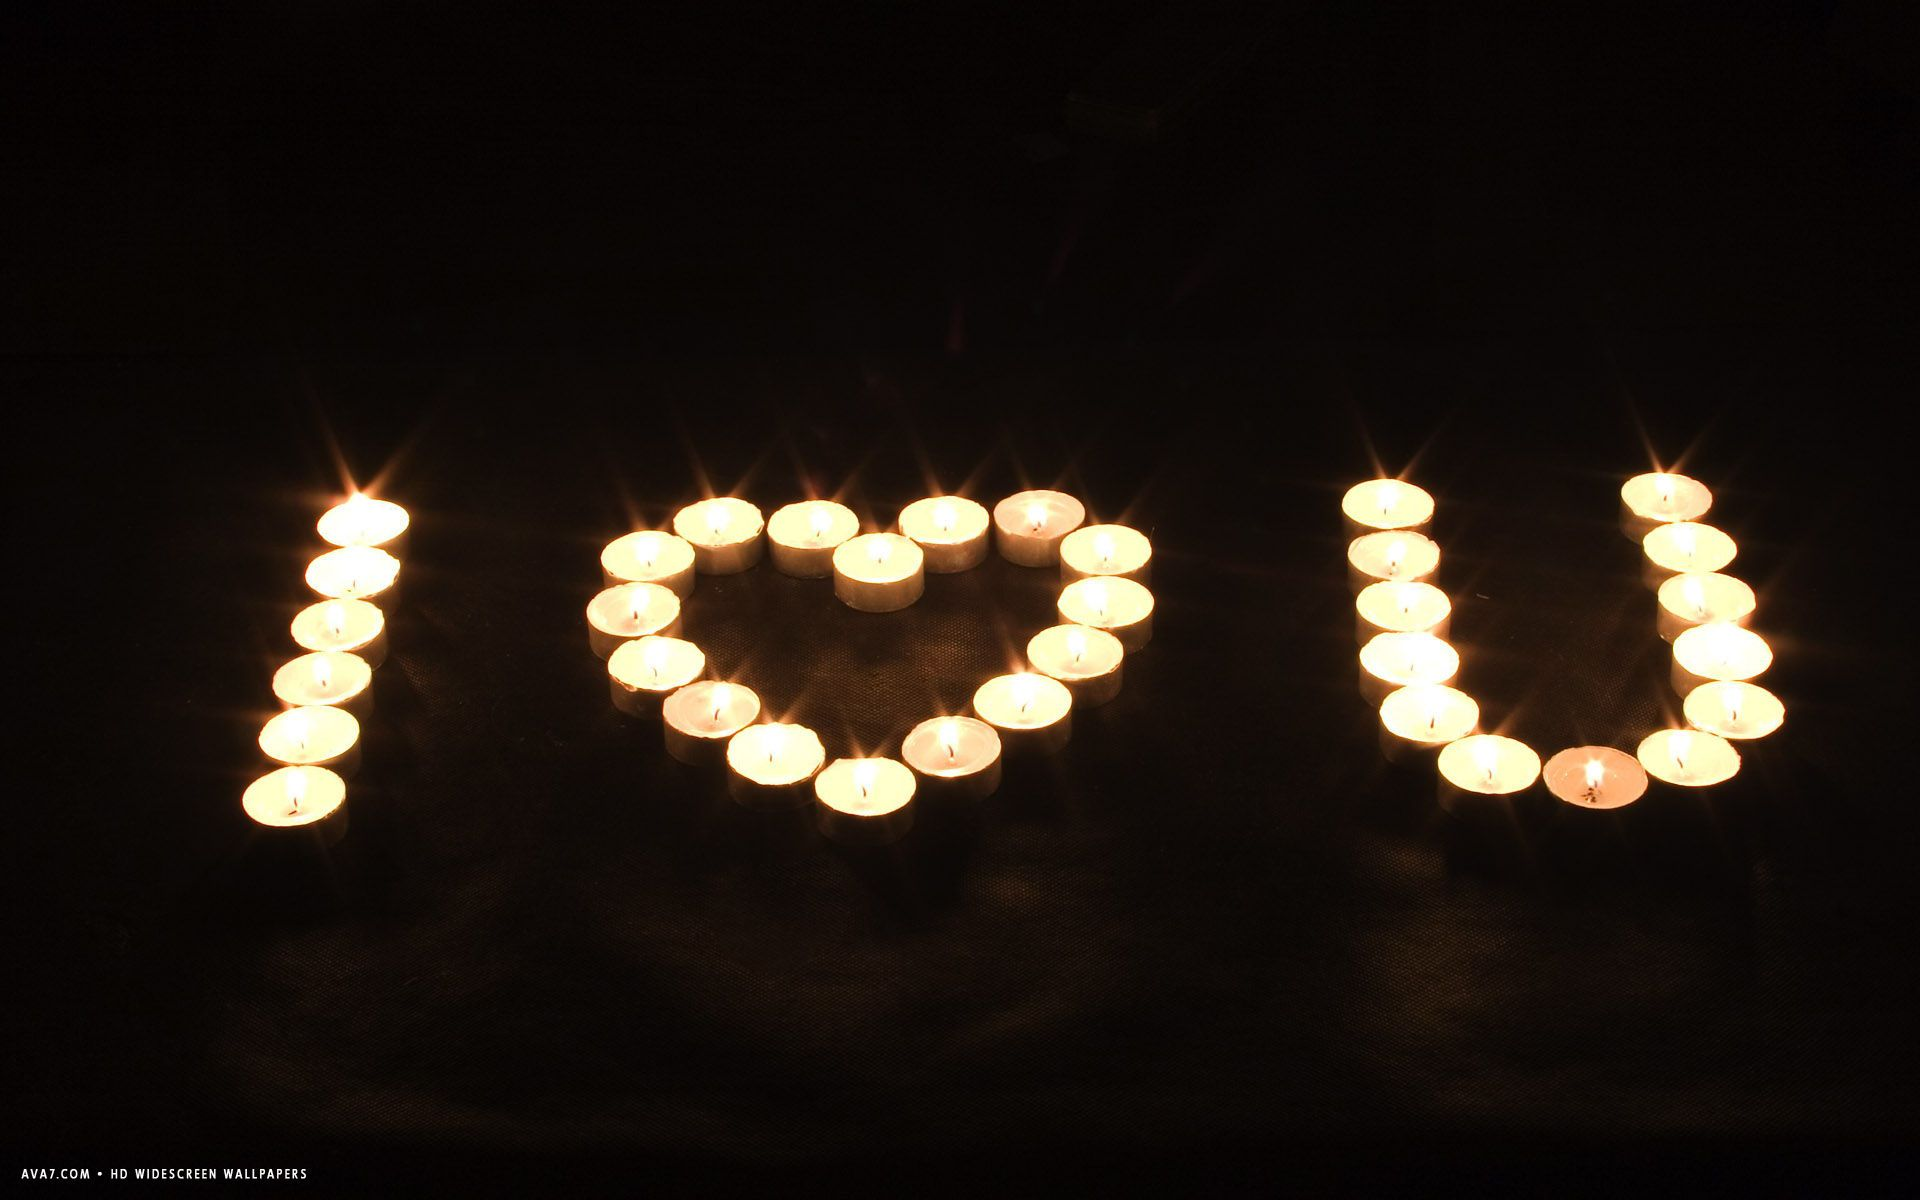 I love u burning candles candle light night hd widescreen wallpaper